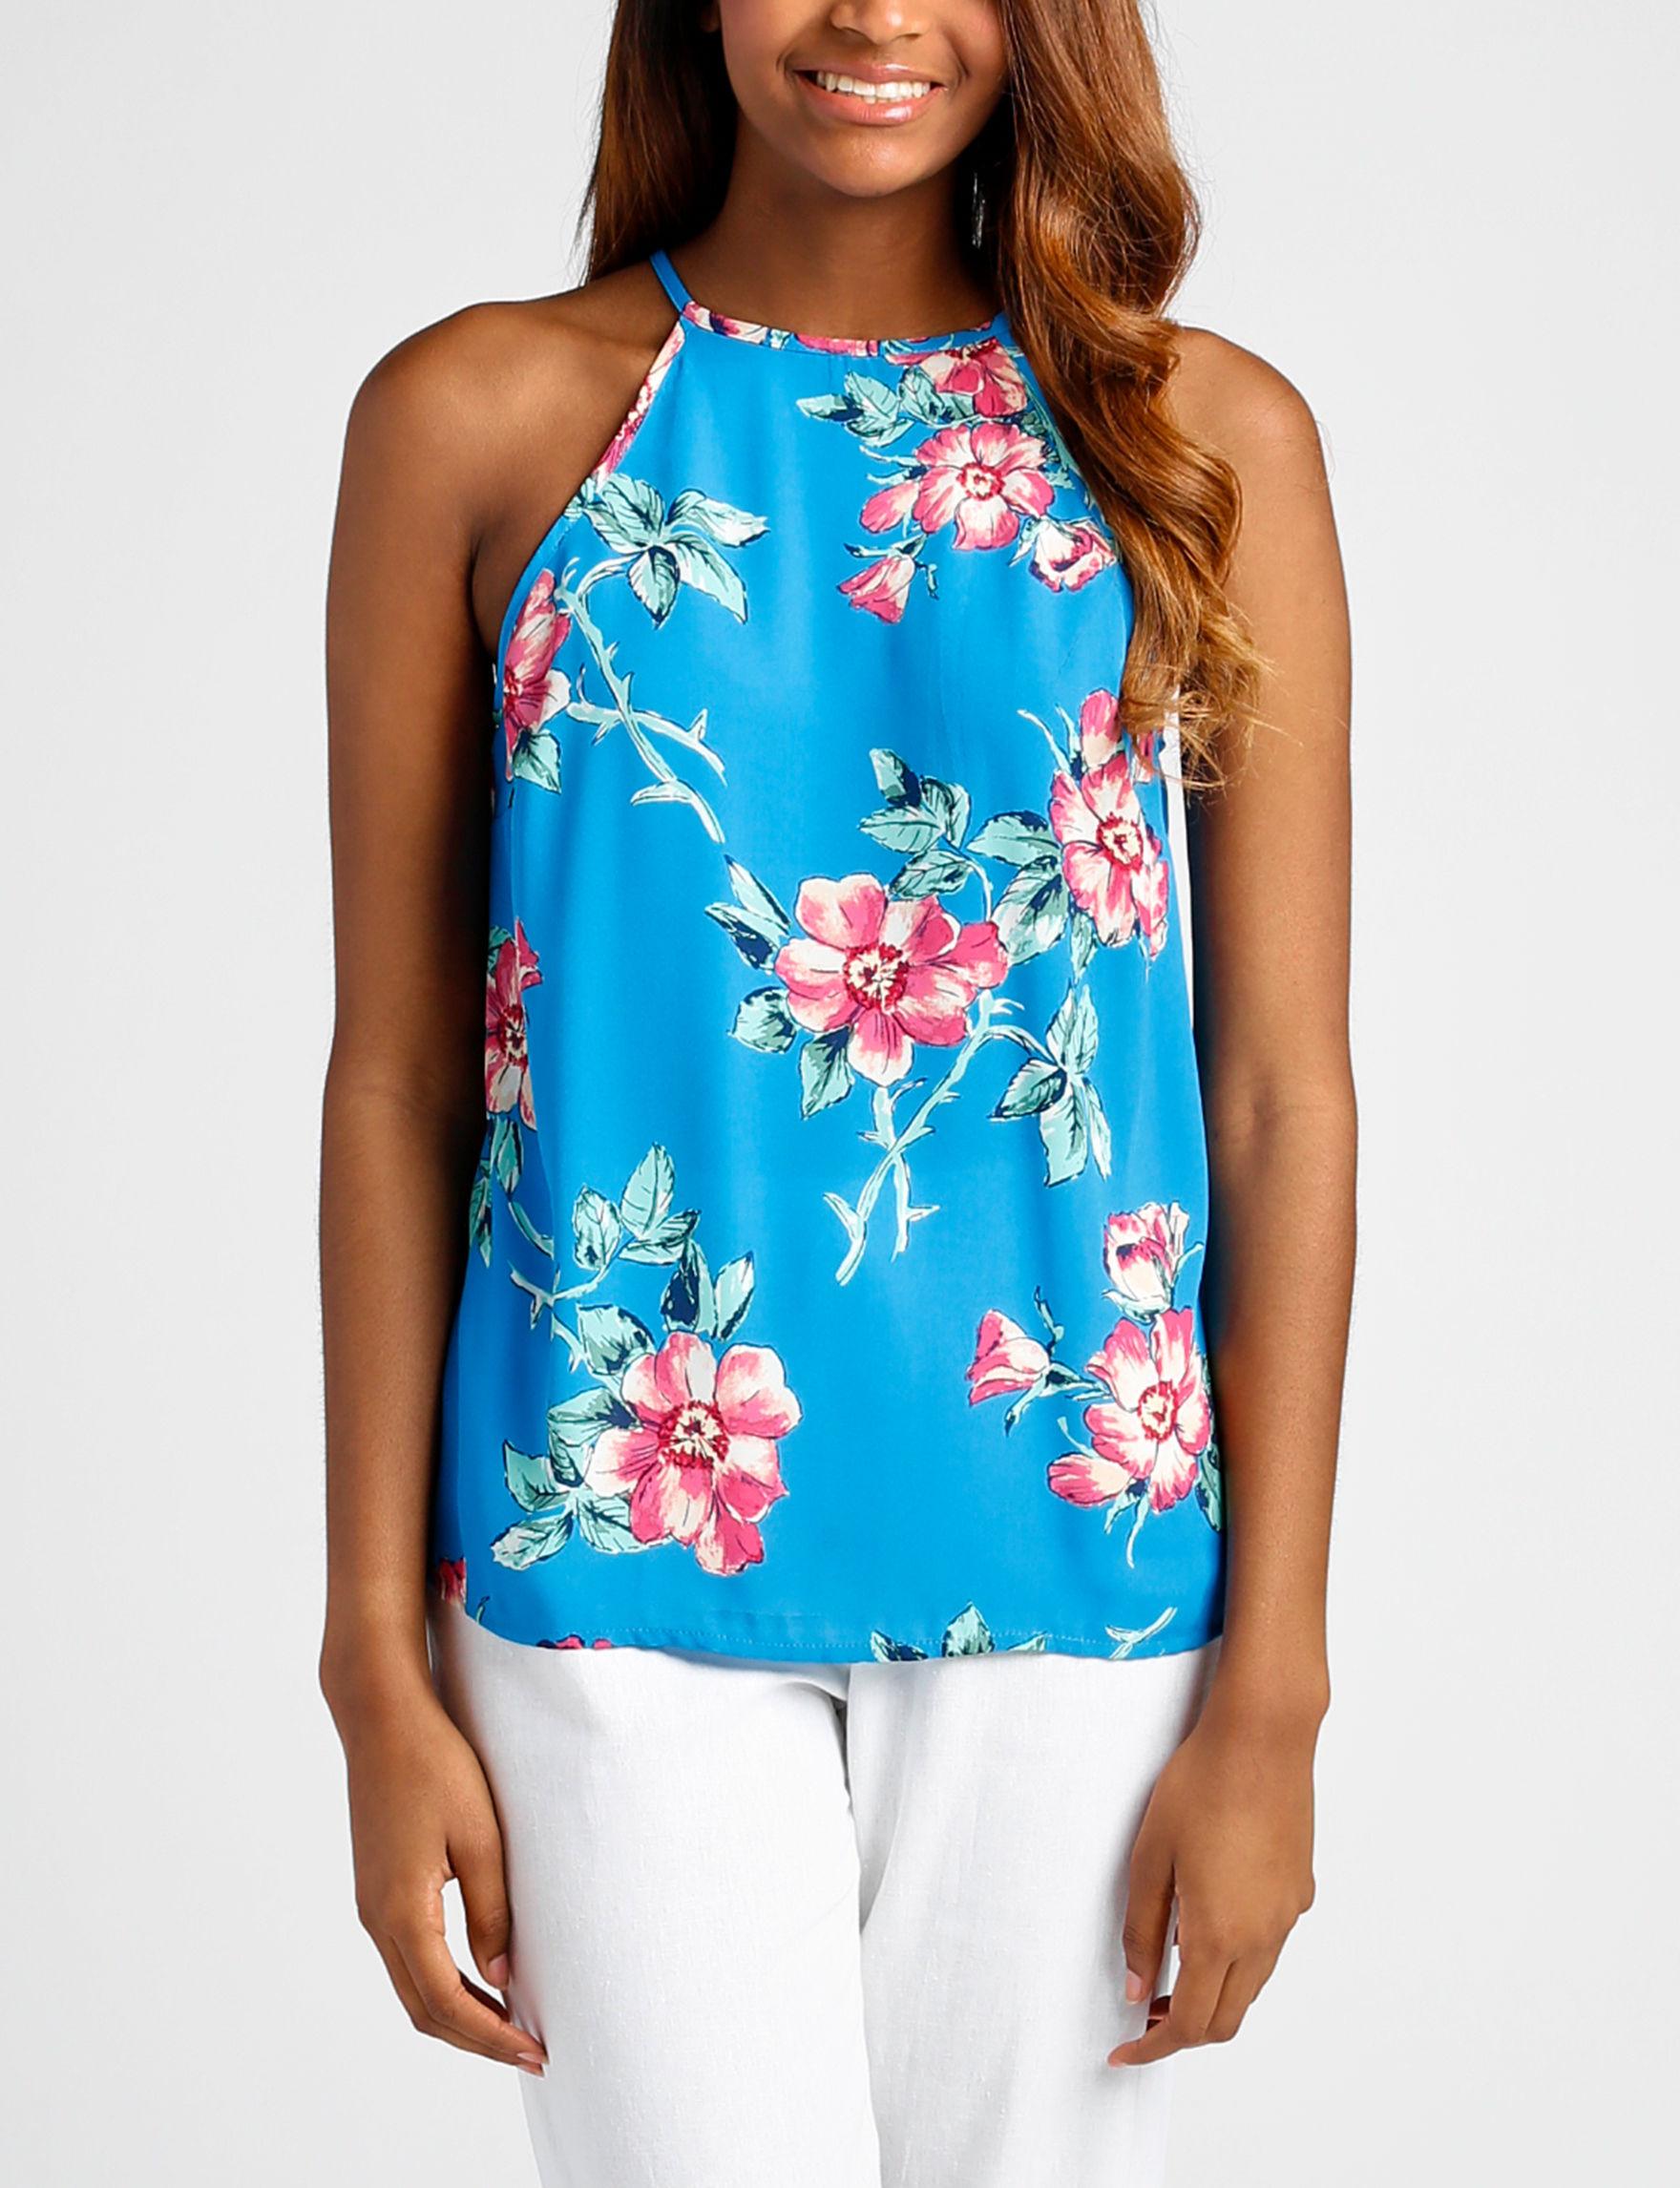 Wishful Park Blue Floral Shirts & Blouses